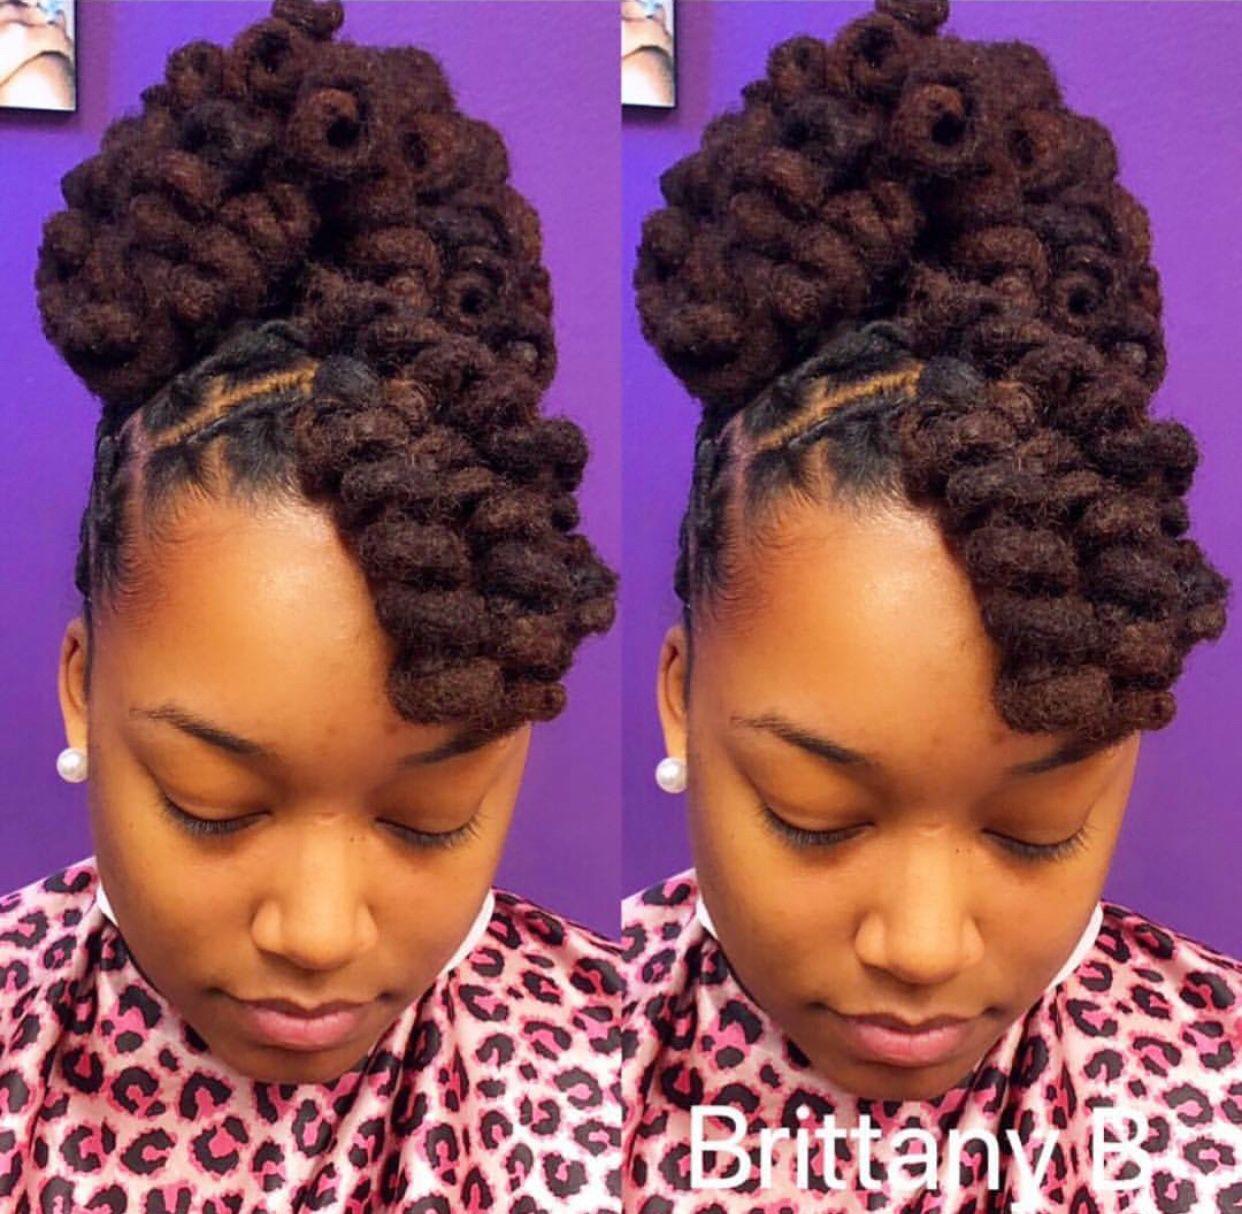 Loc Style Dreadlock Hairstyles Black Beautiful Dreadlocks Hair Styles